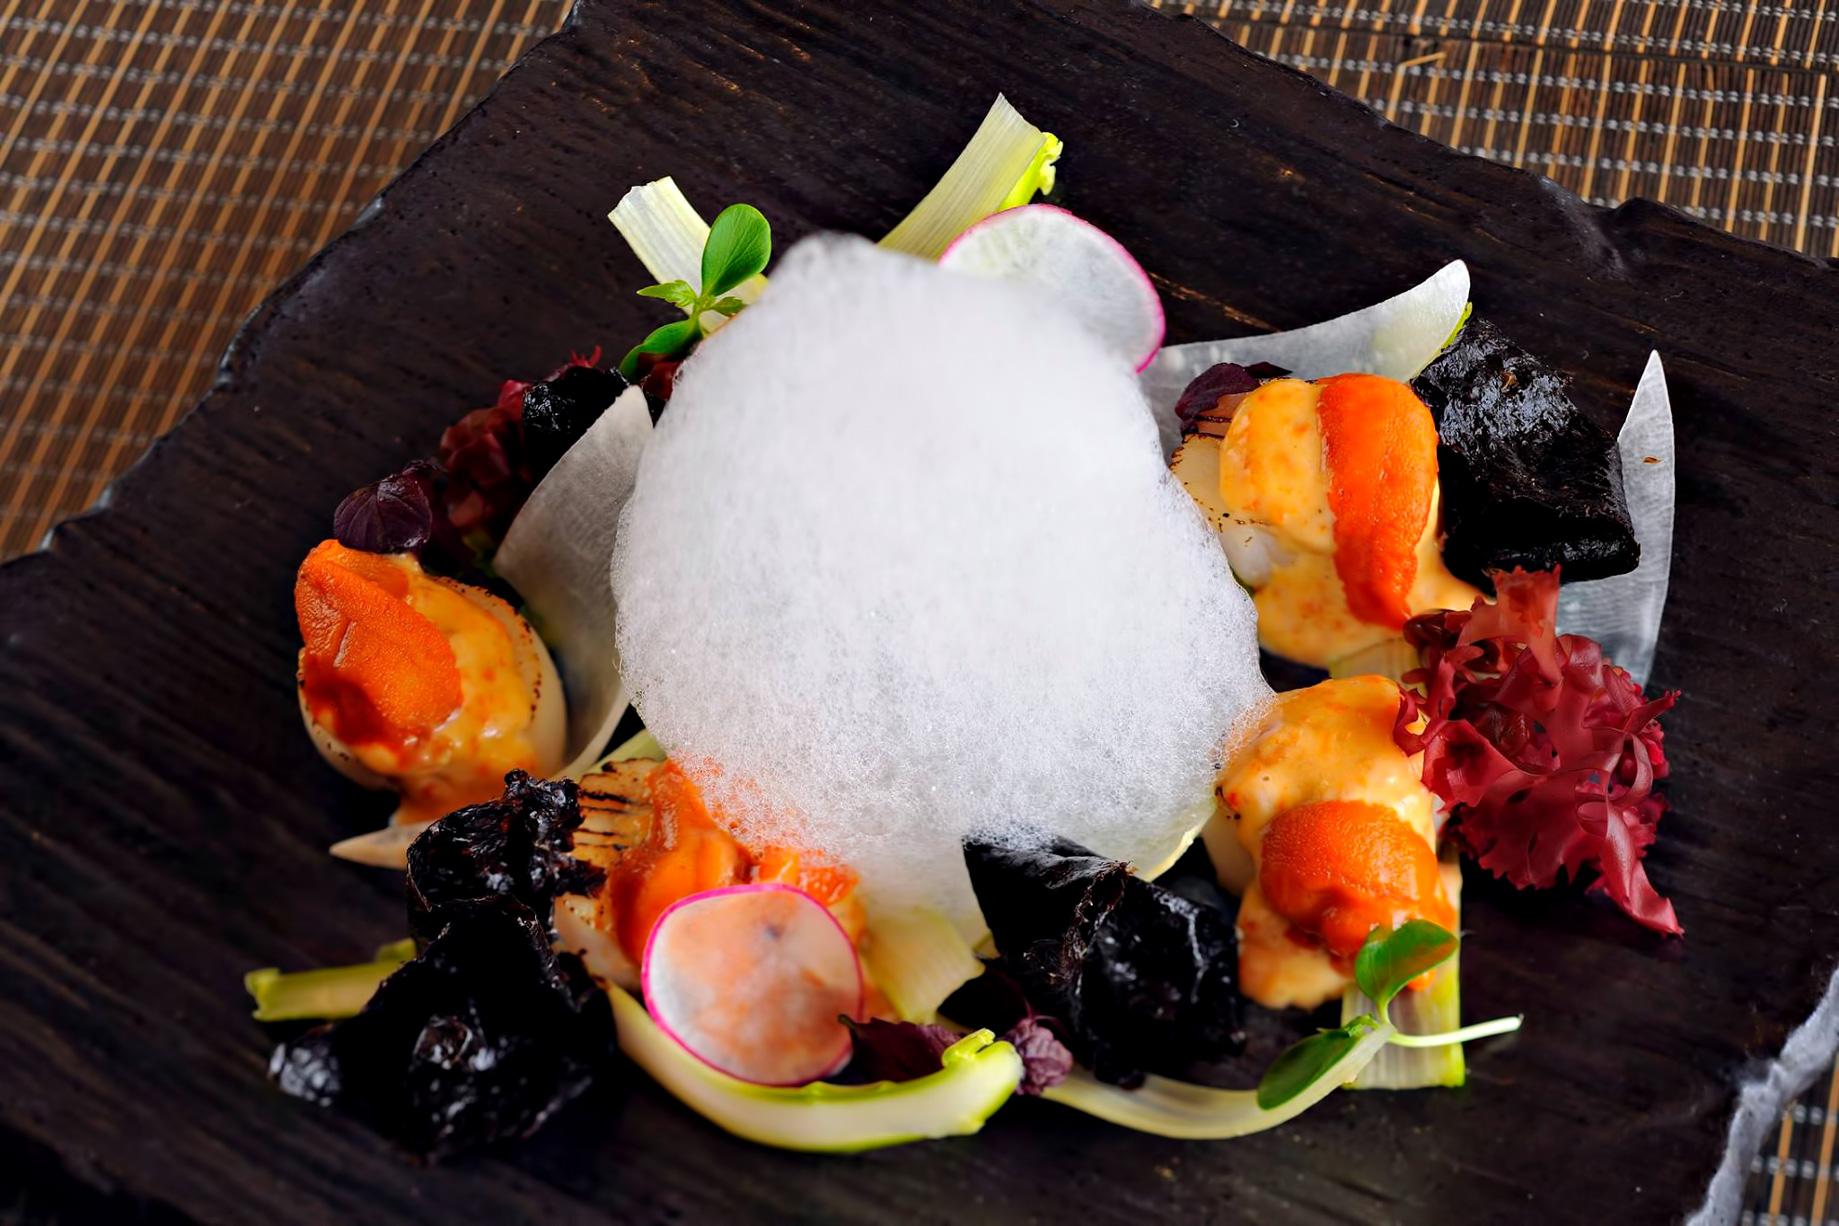 Armani Hotel Dubai – Burj Khalifa, Dubaï, Émirats arabes unis – Armani art culinaire exquis